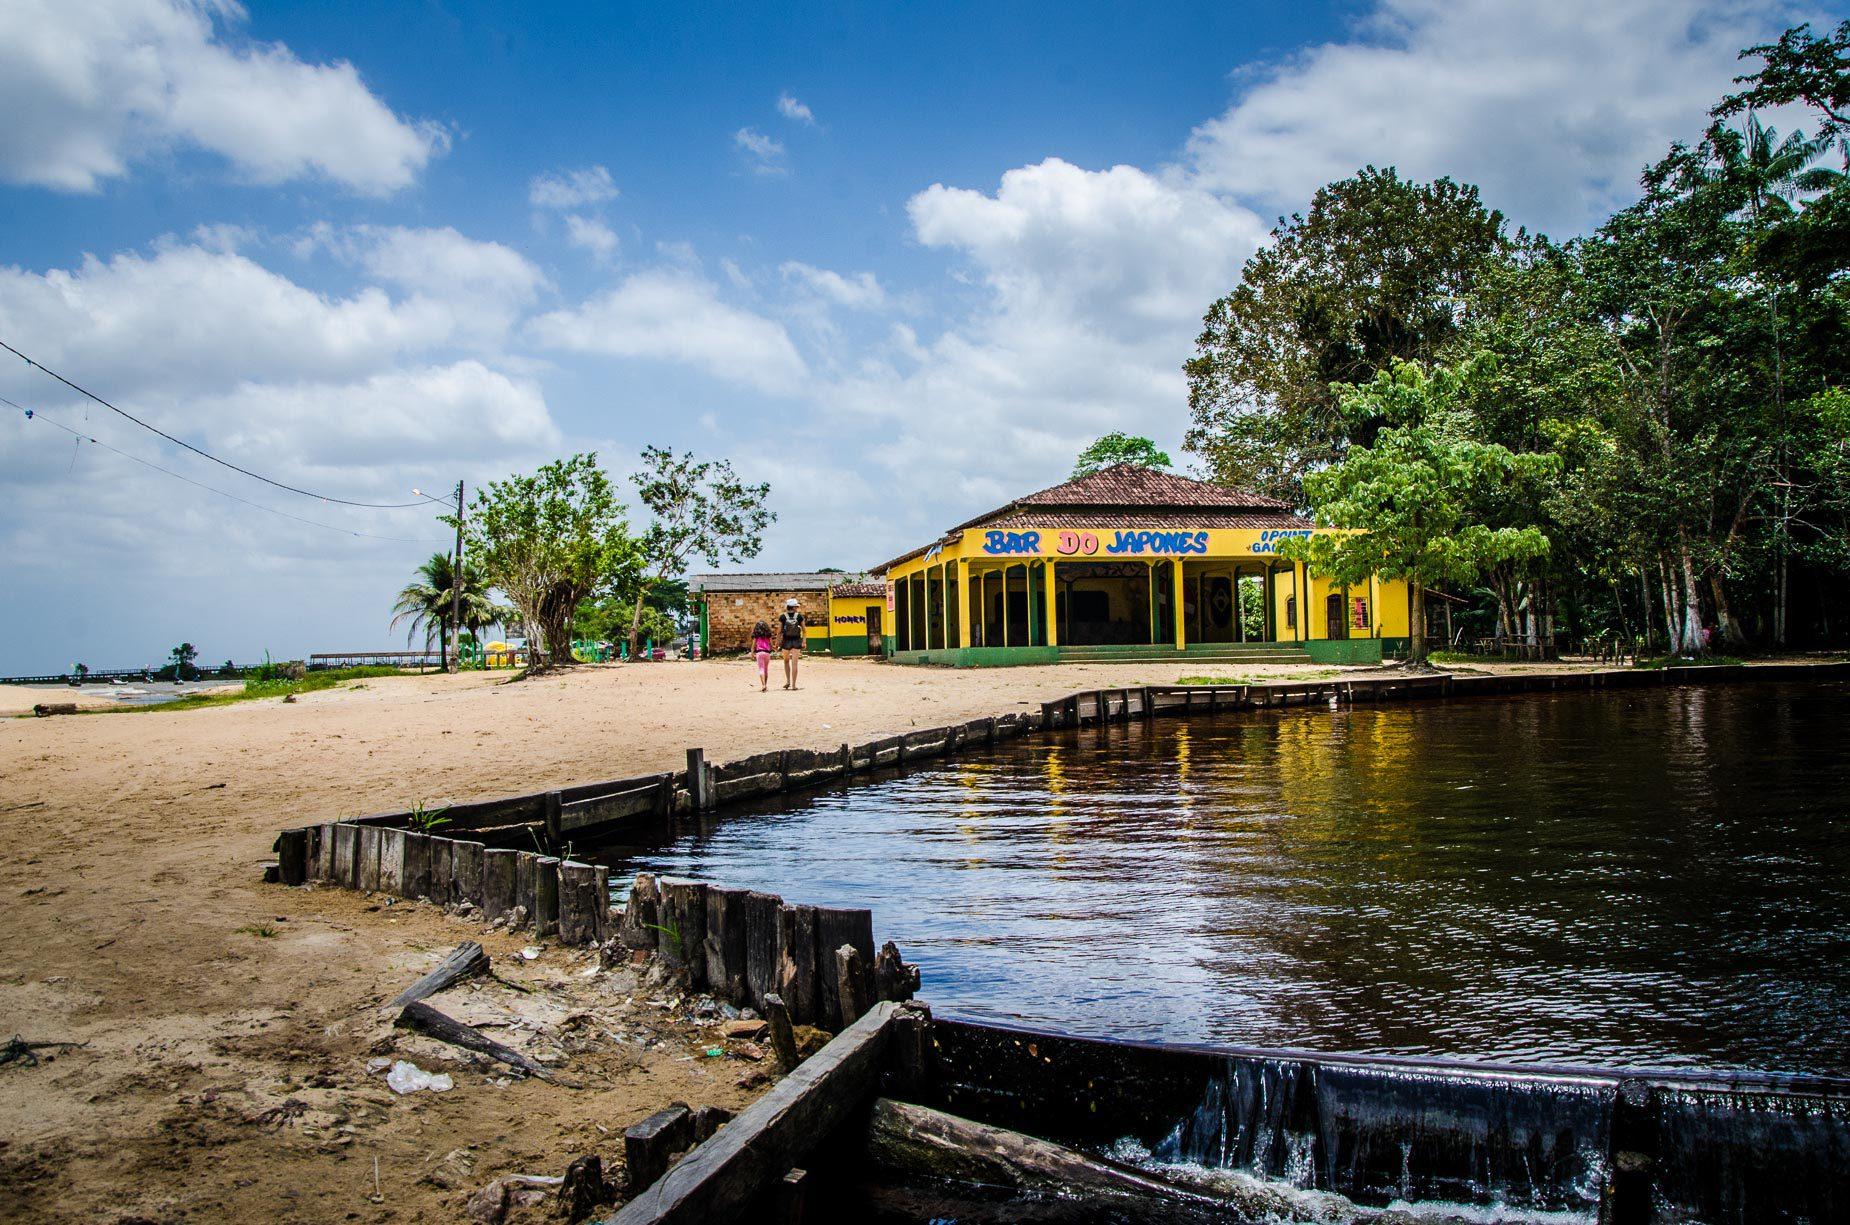 Igarapé em Colares - Pará - Brasil